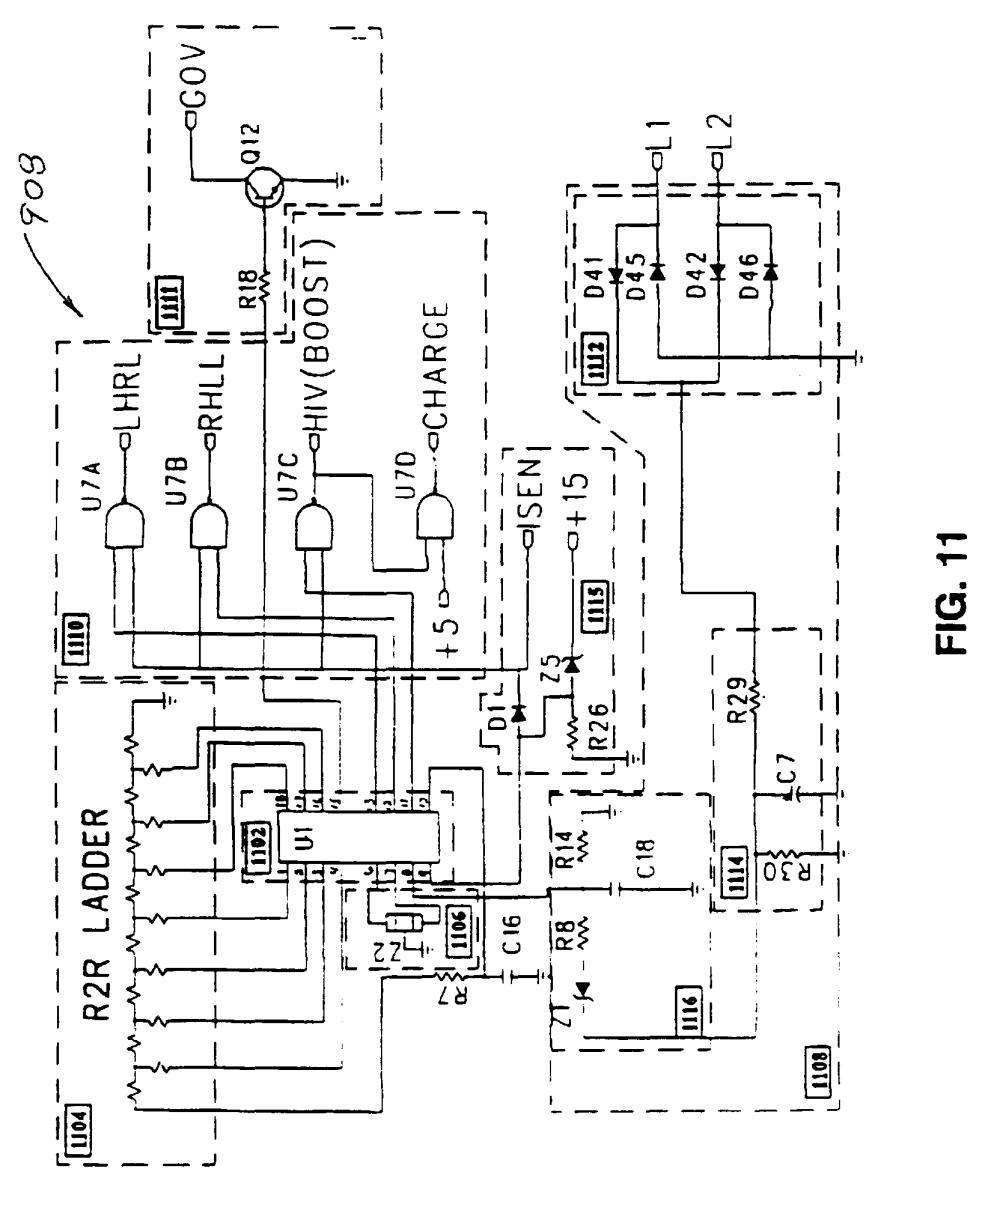 medium resolution of reversing motor wiring diagrams single phase self king reversing